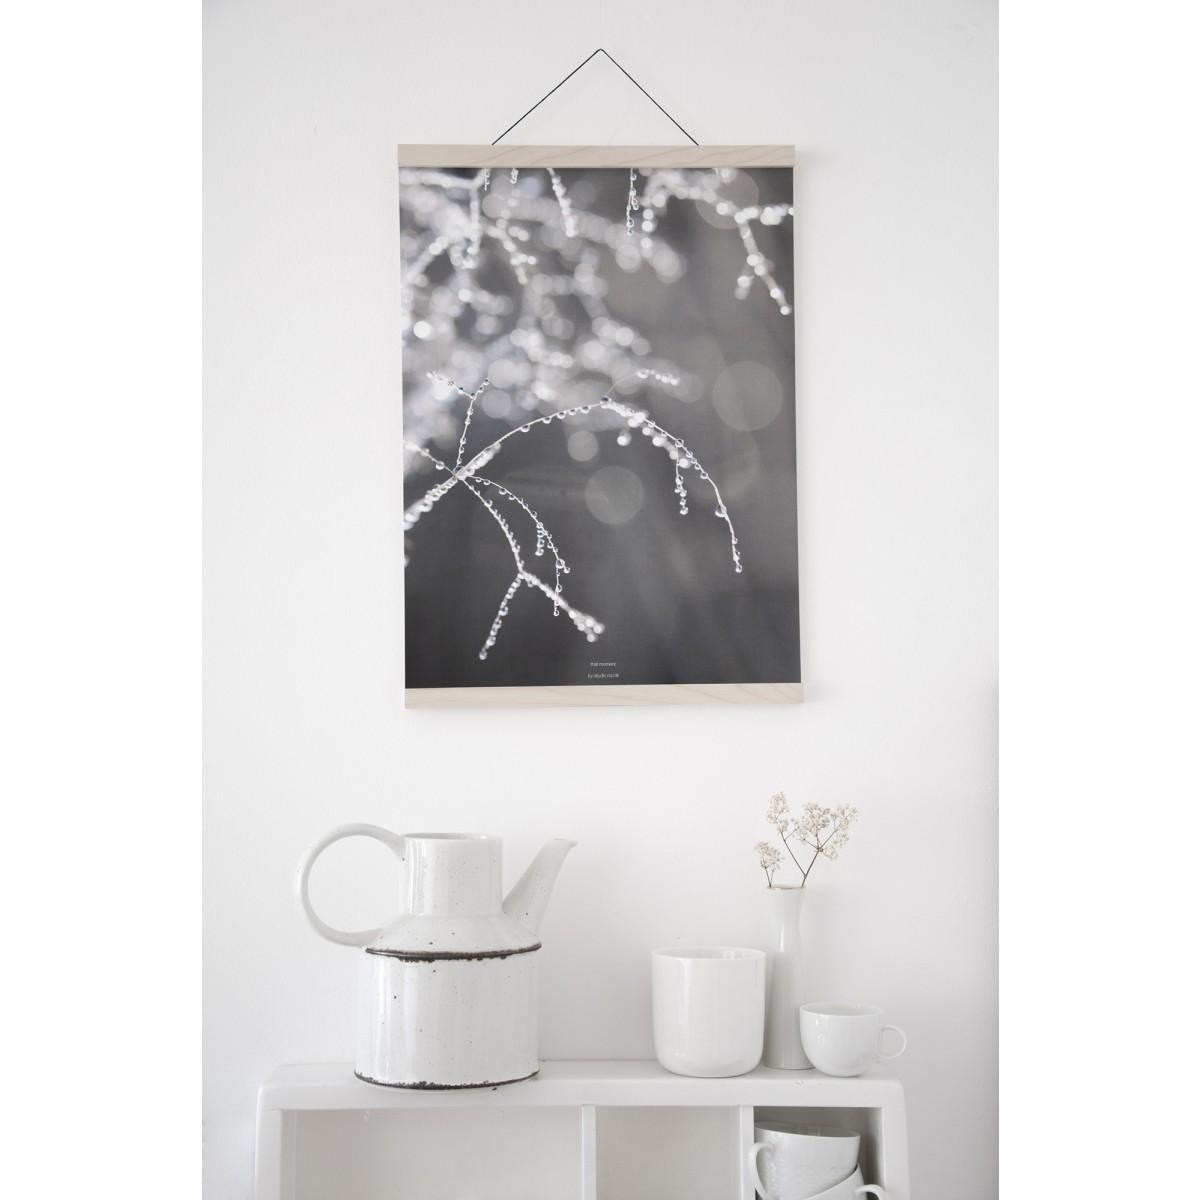 na.hili magnetische Posterleiste, Click-on-FRAME, Rahmen A3, Ahorn, Eiche, Nuss